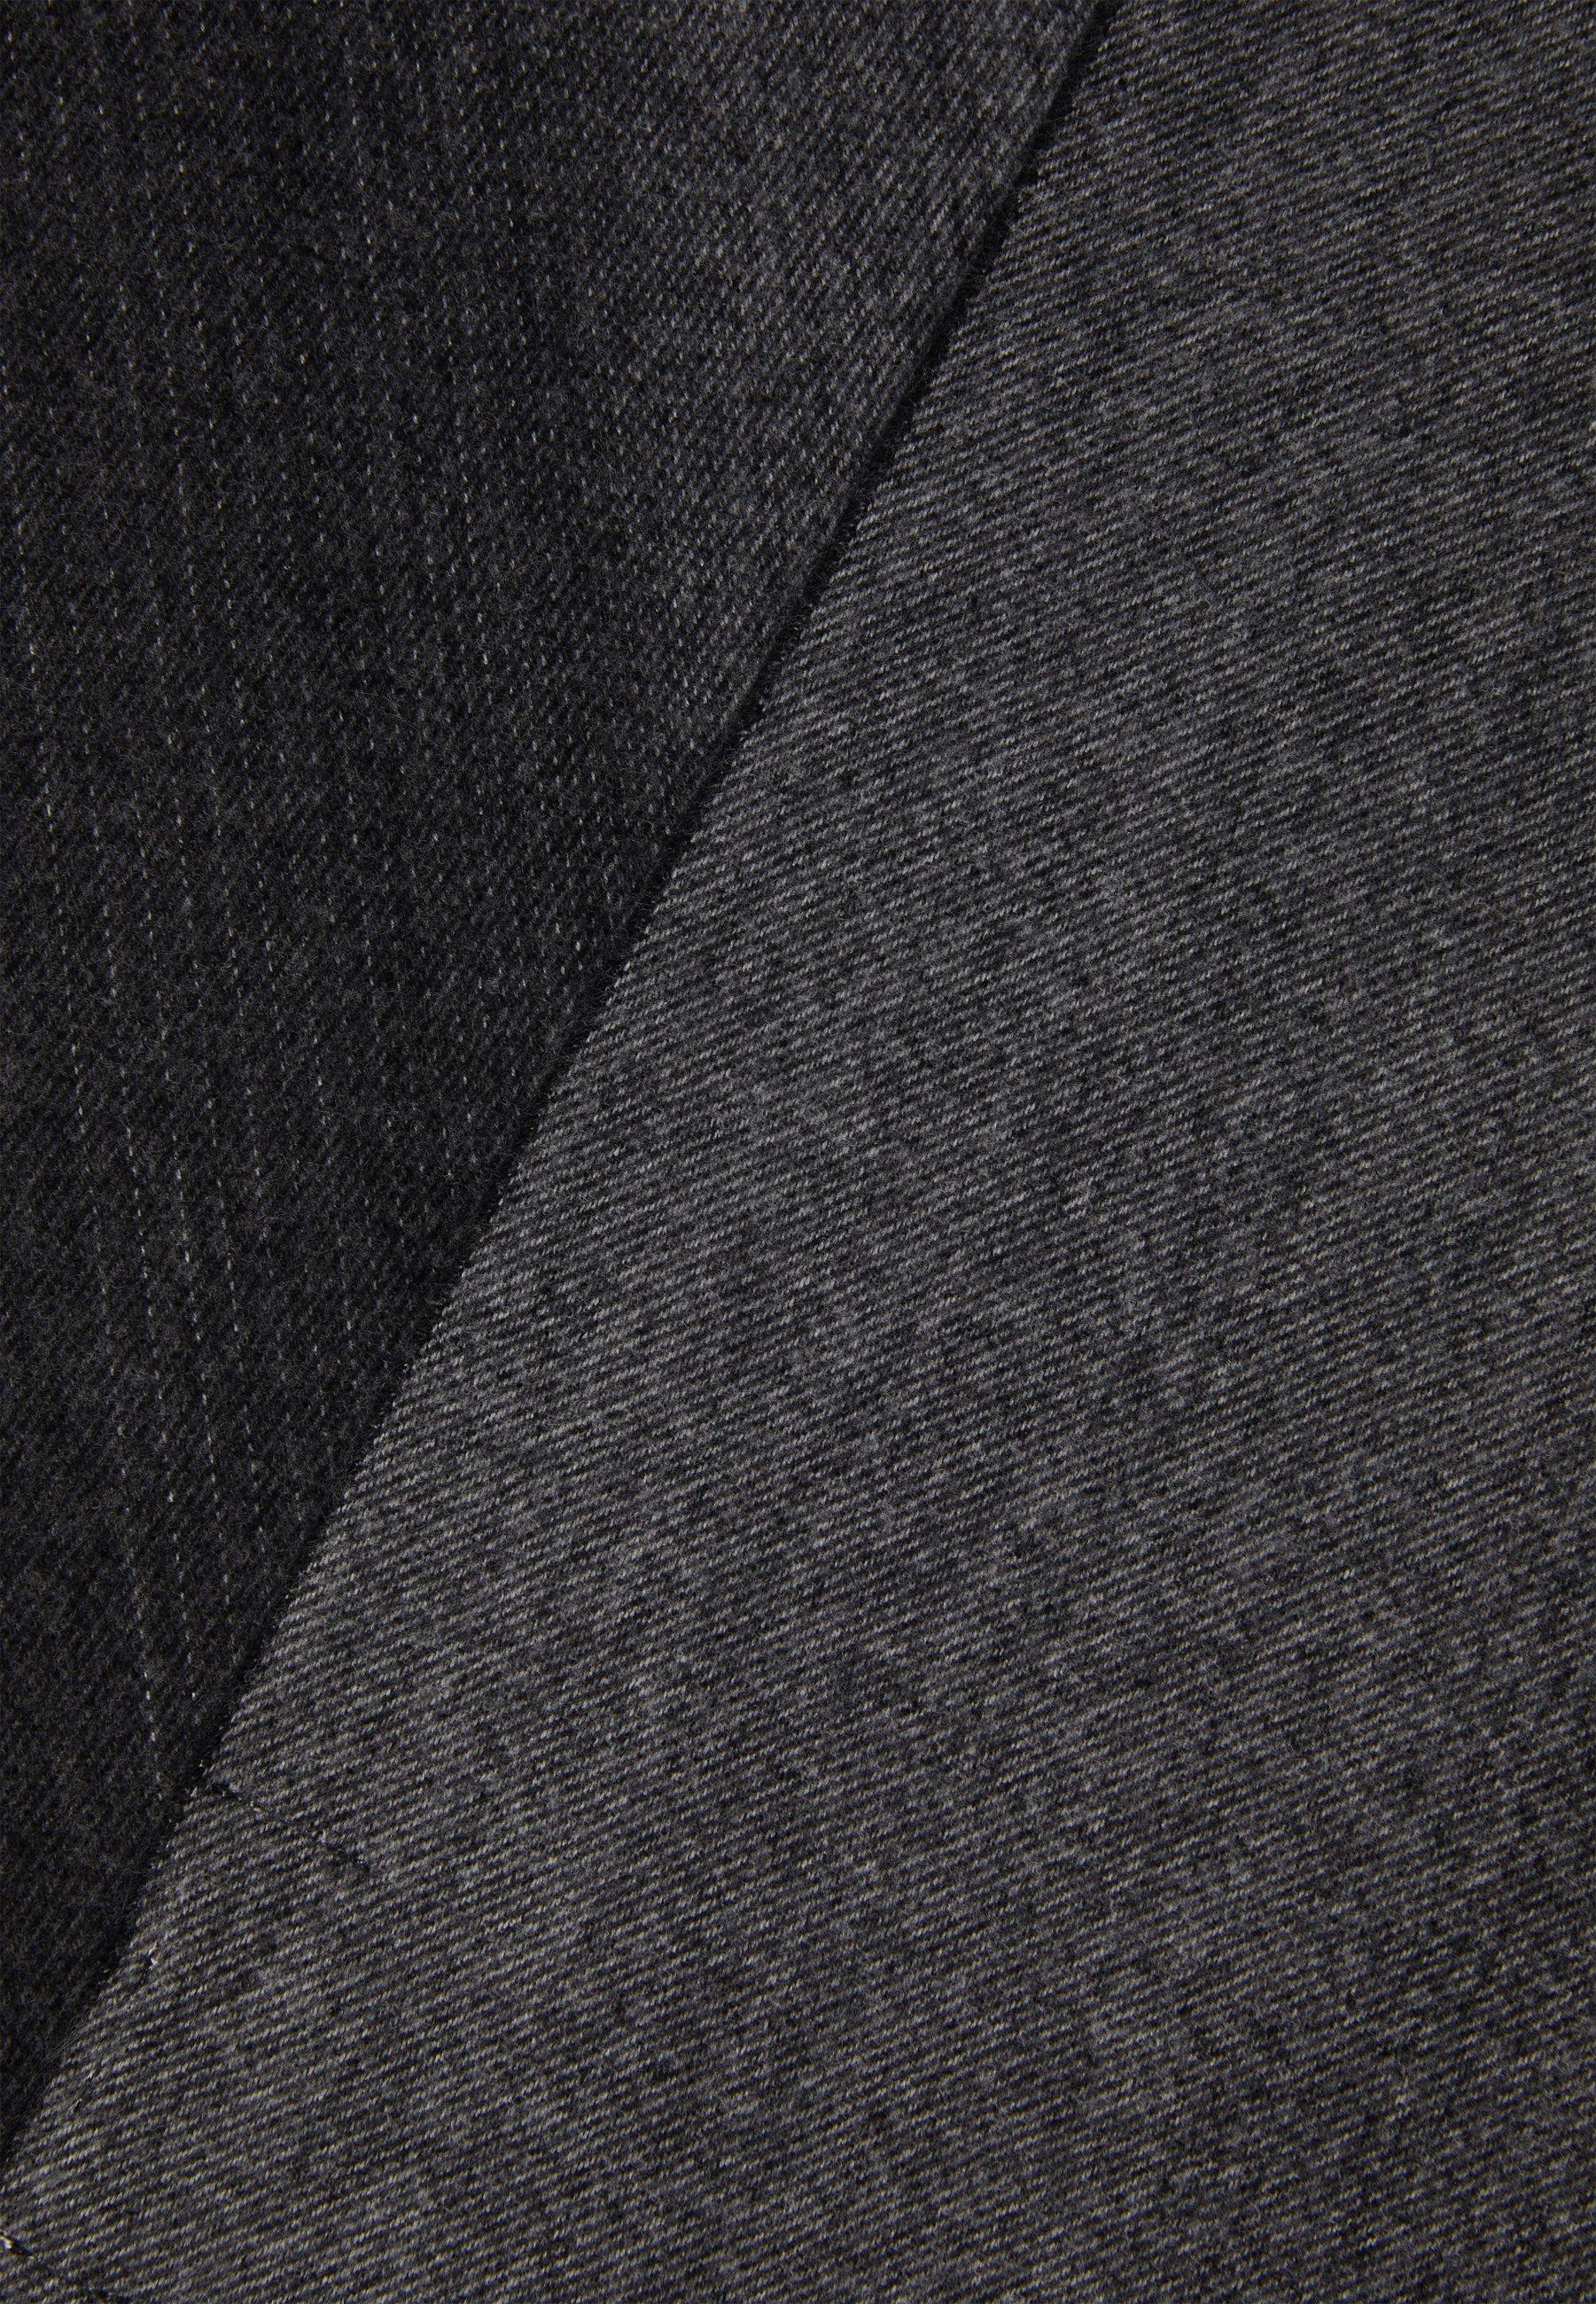 Pier One Set - Schal Grey/black/grau